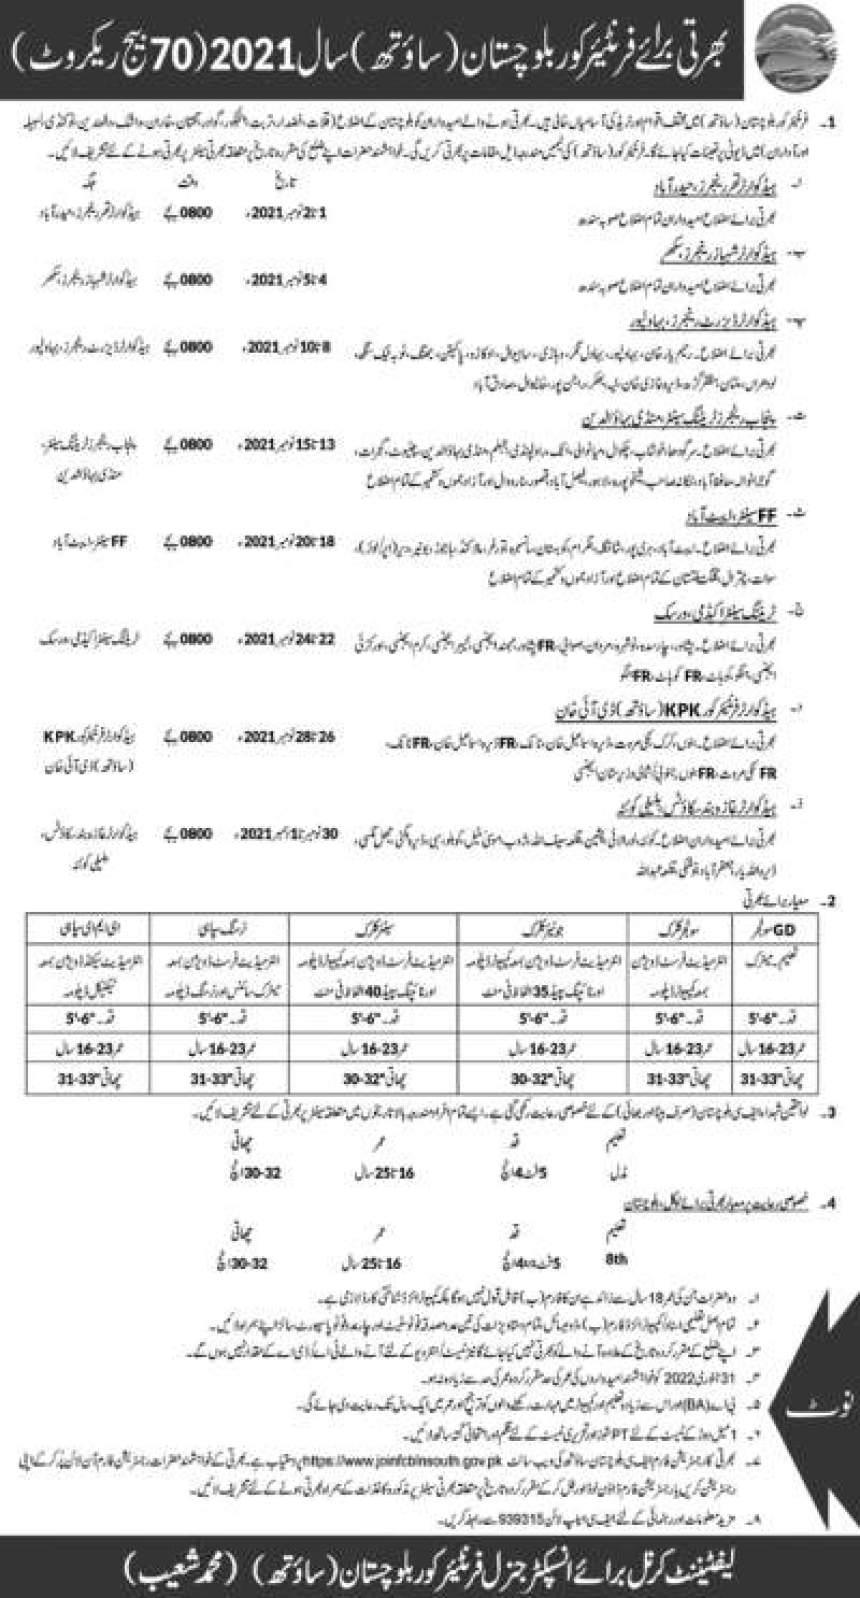 FC Balochistan South Jobs 2021 Batch 70- Apply online